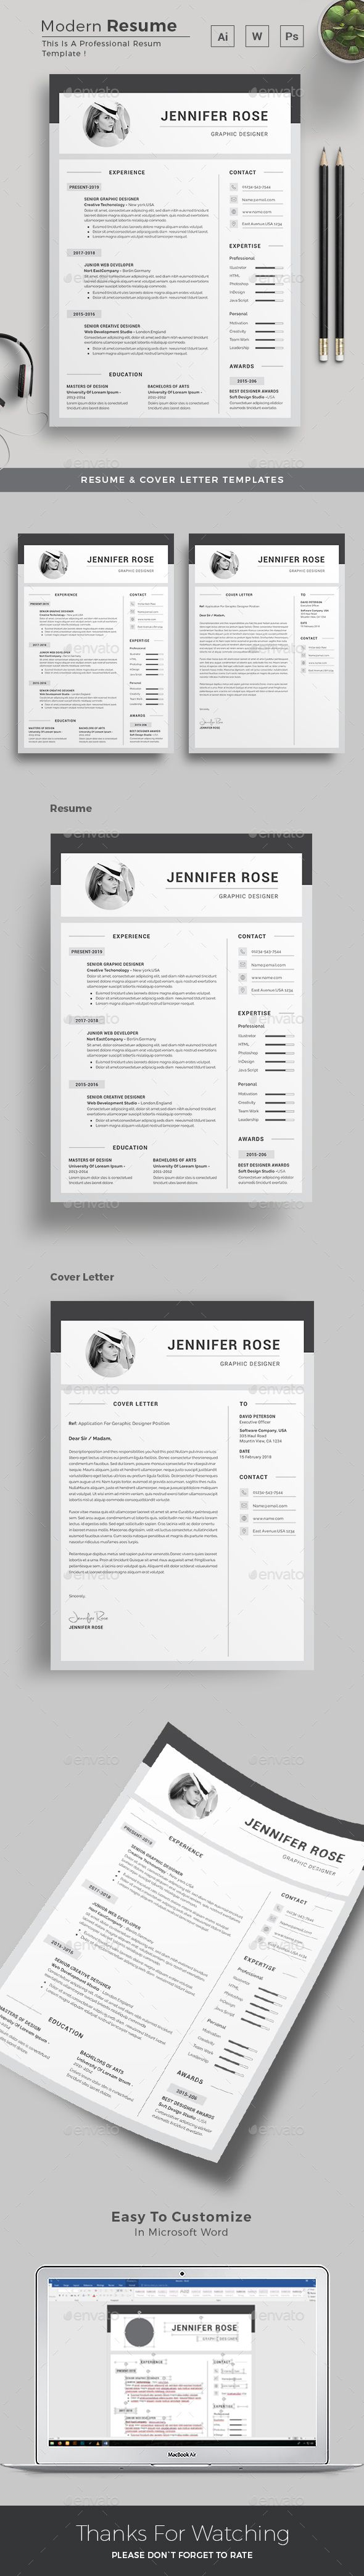 Best Best Resume  Images On   Curriculum Cv